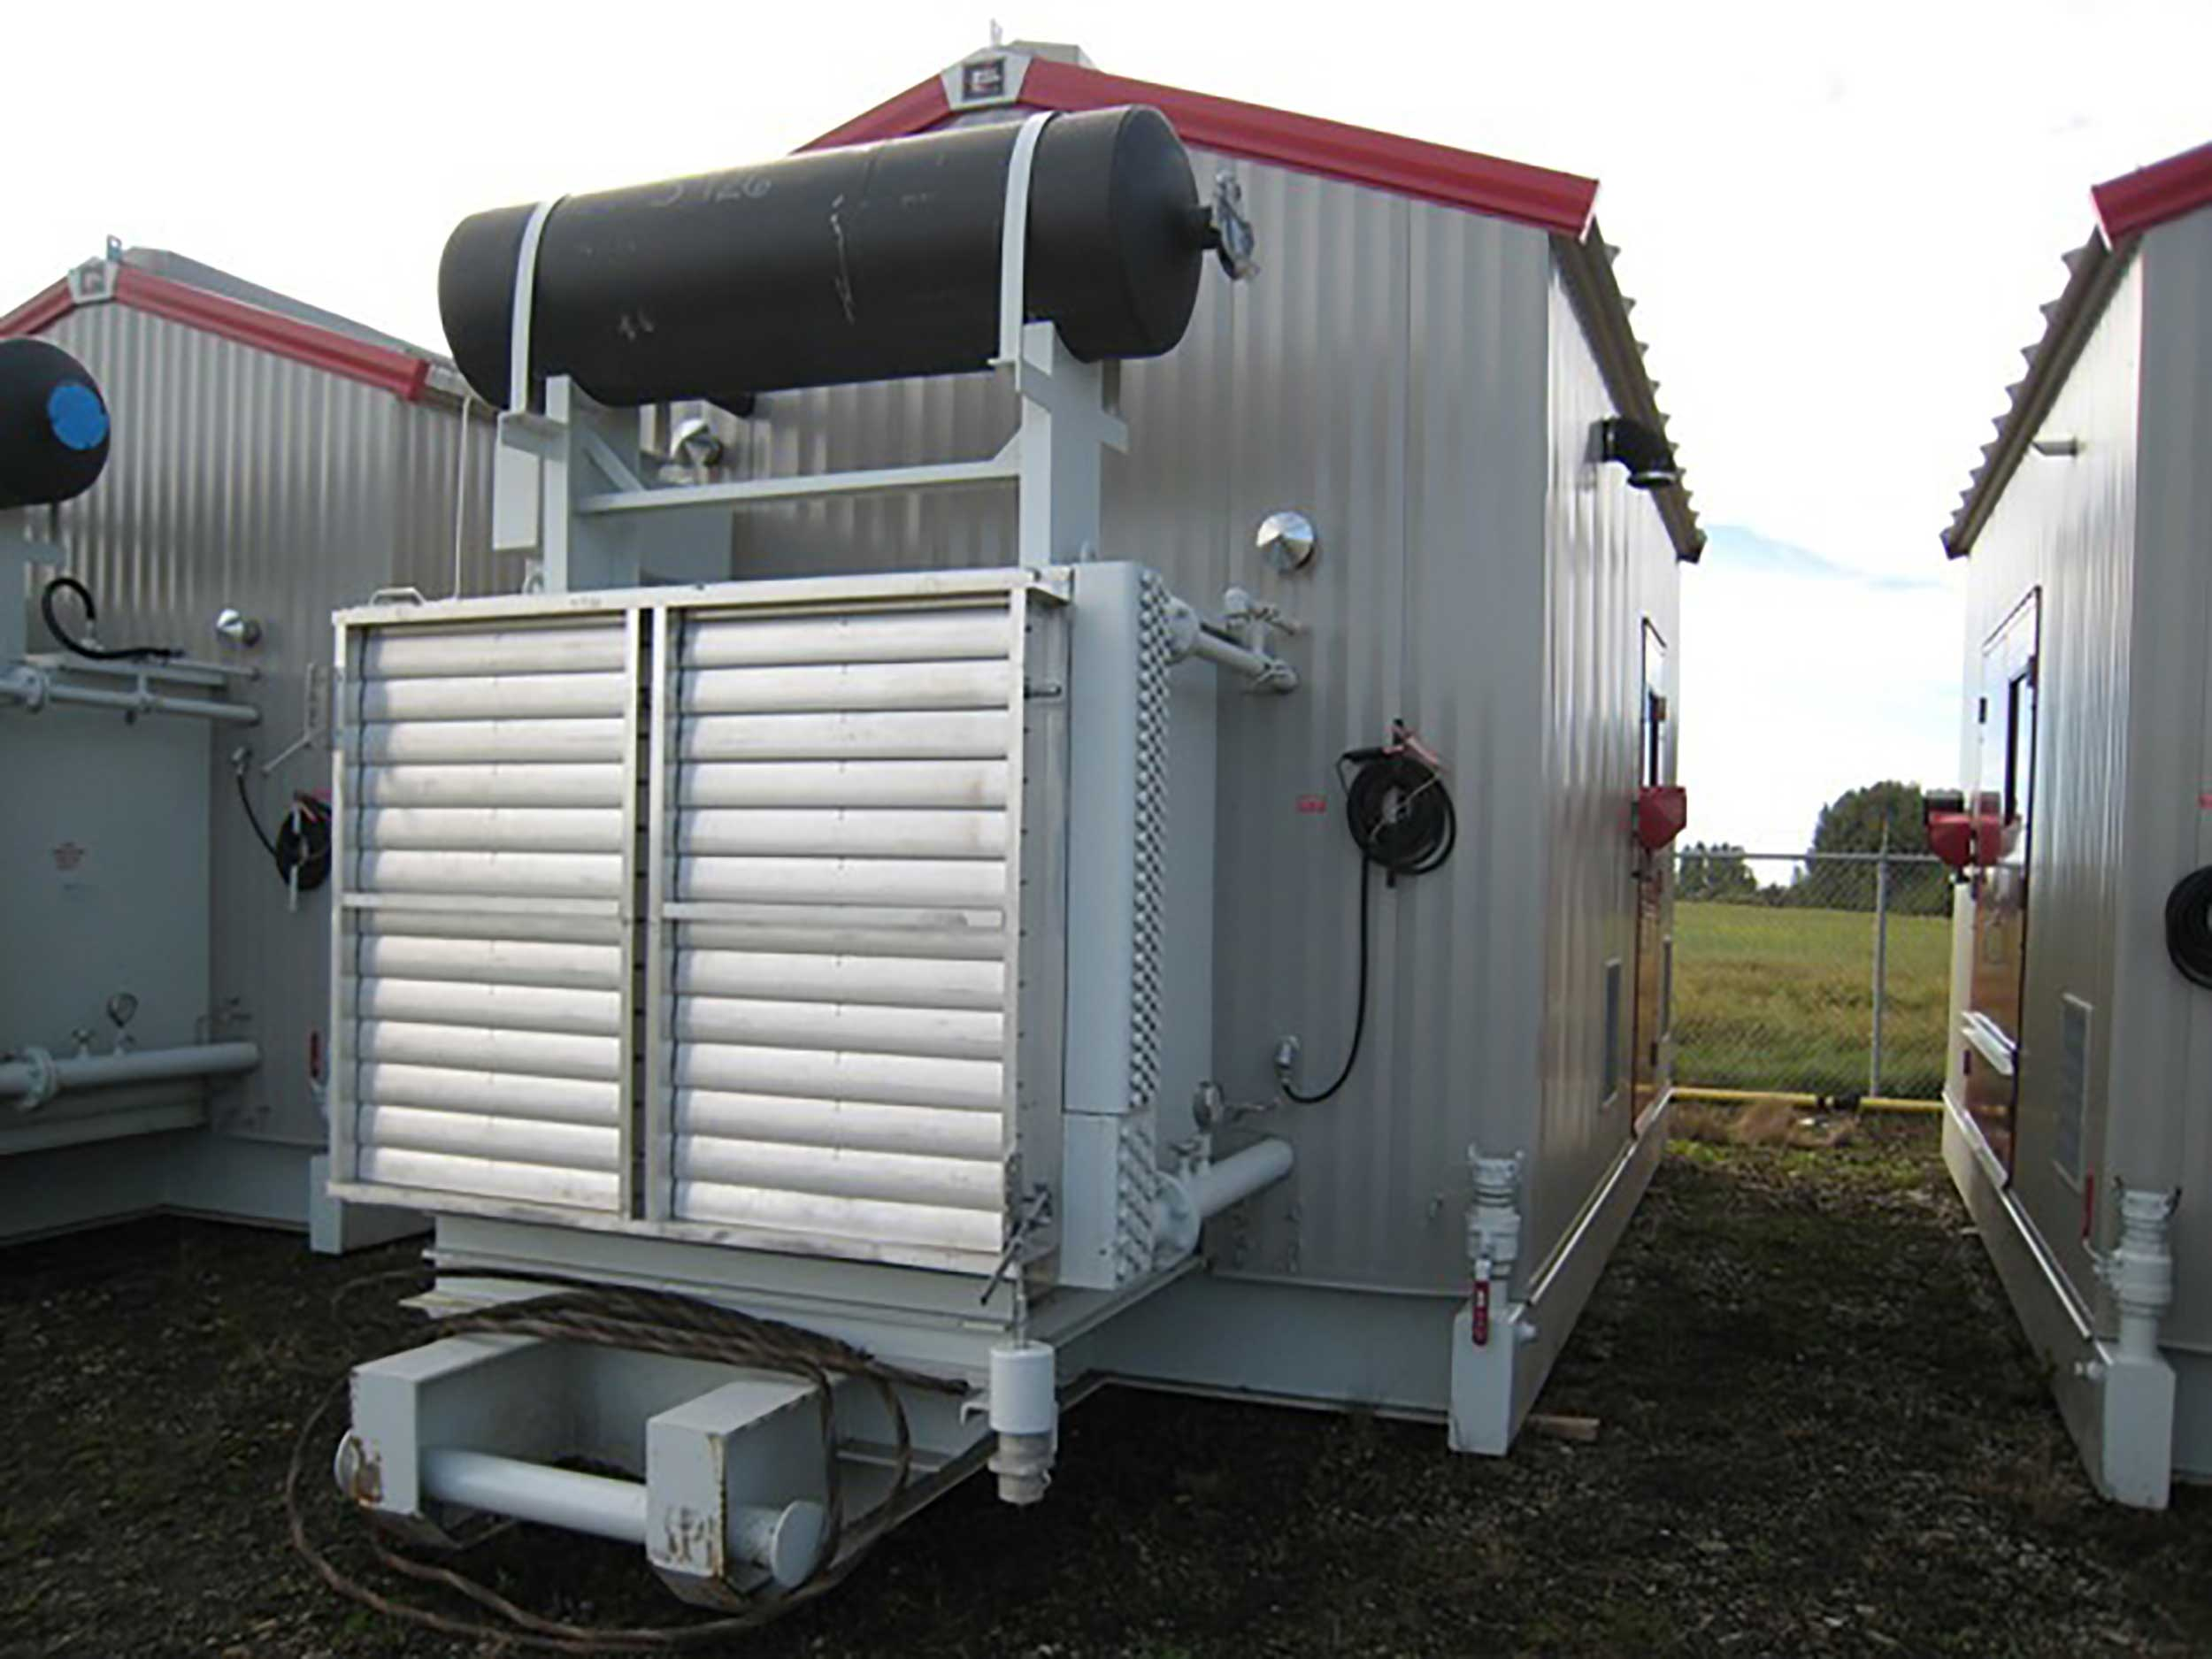 Exterior 2 New / Never Used 95HP Caterpillar Vacuum Reciprocating Compressors For Sale in Alberta Canada